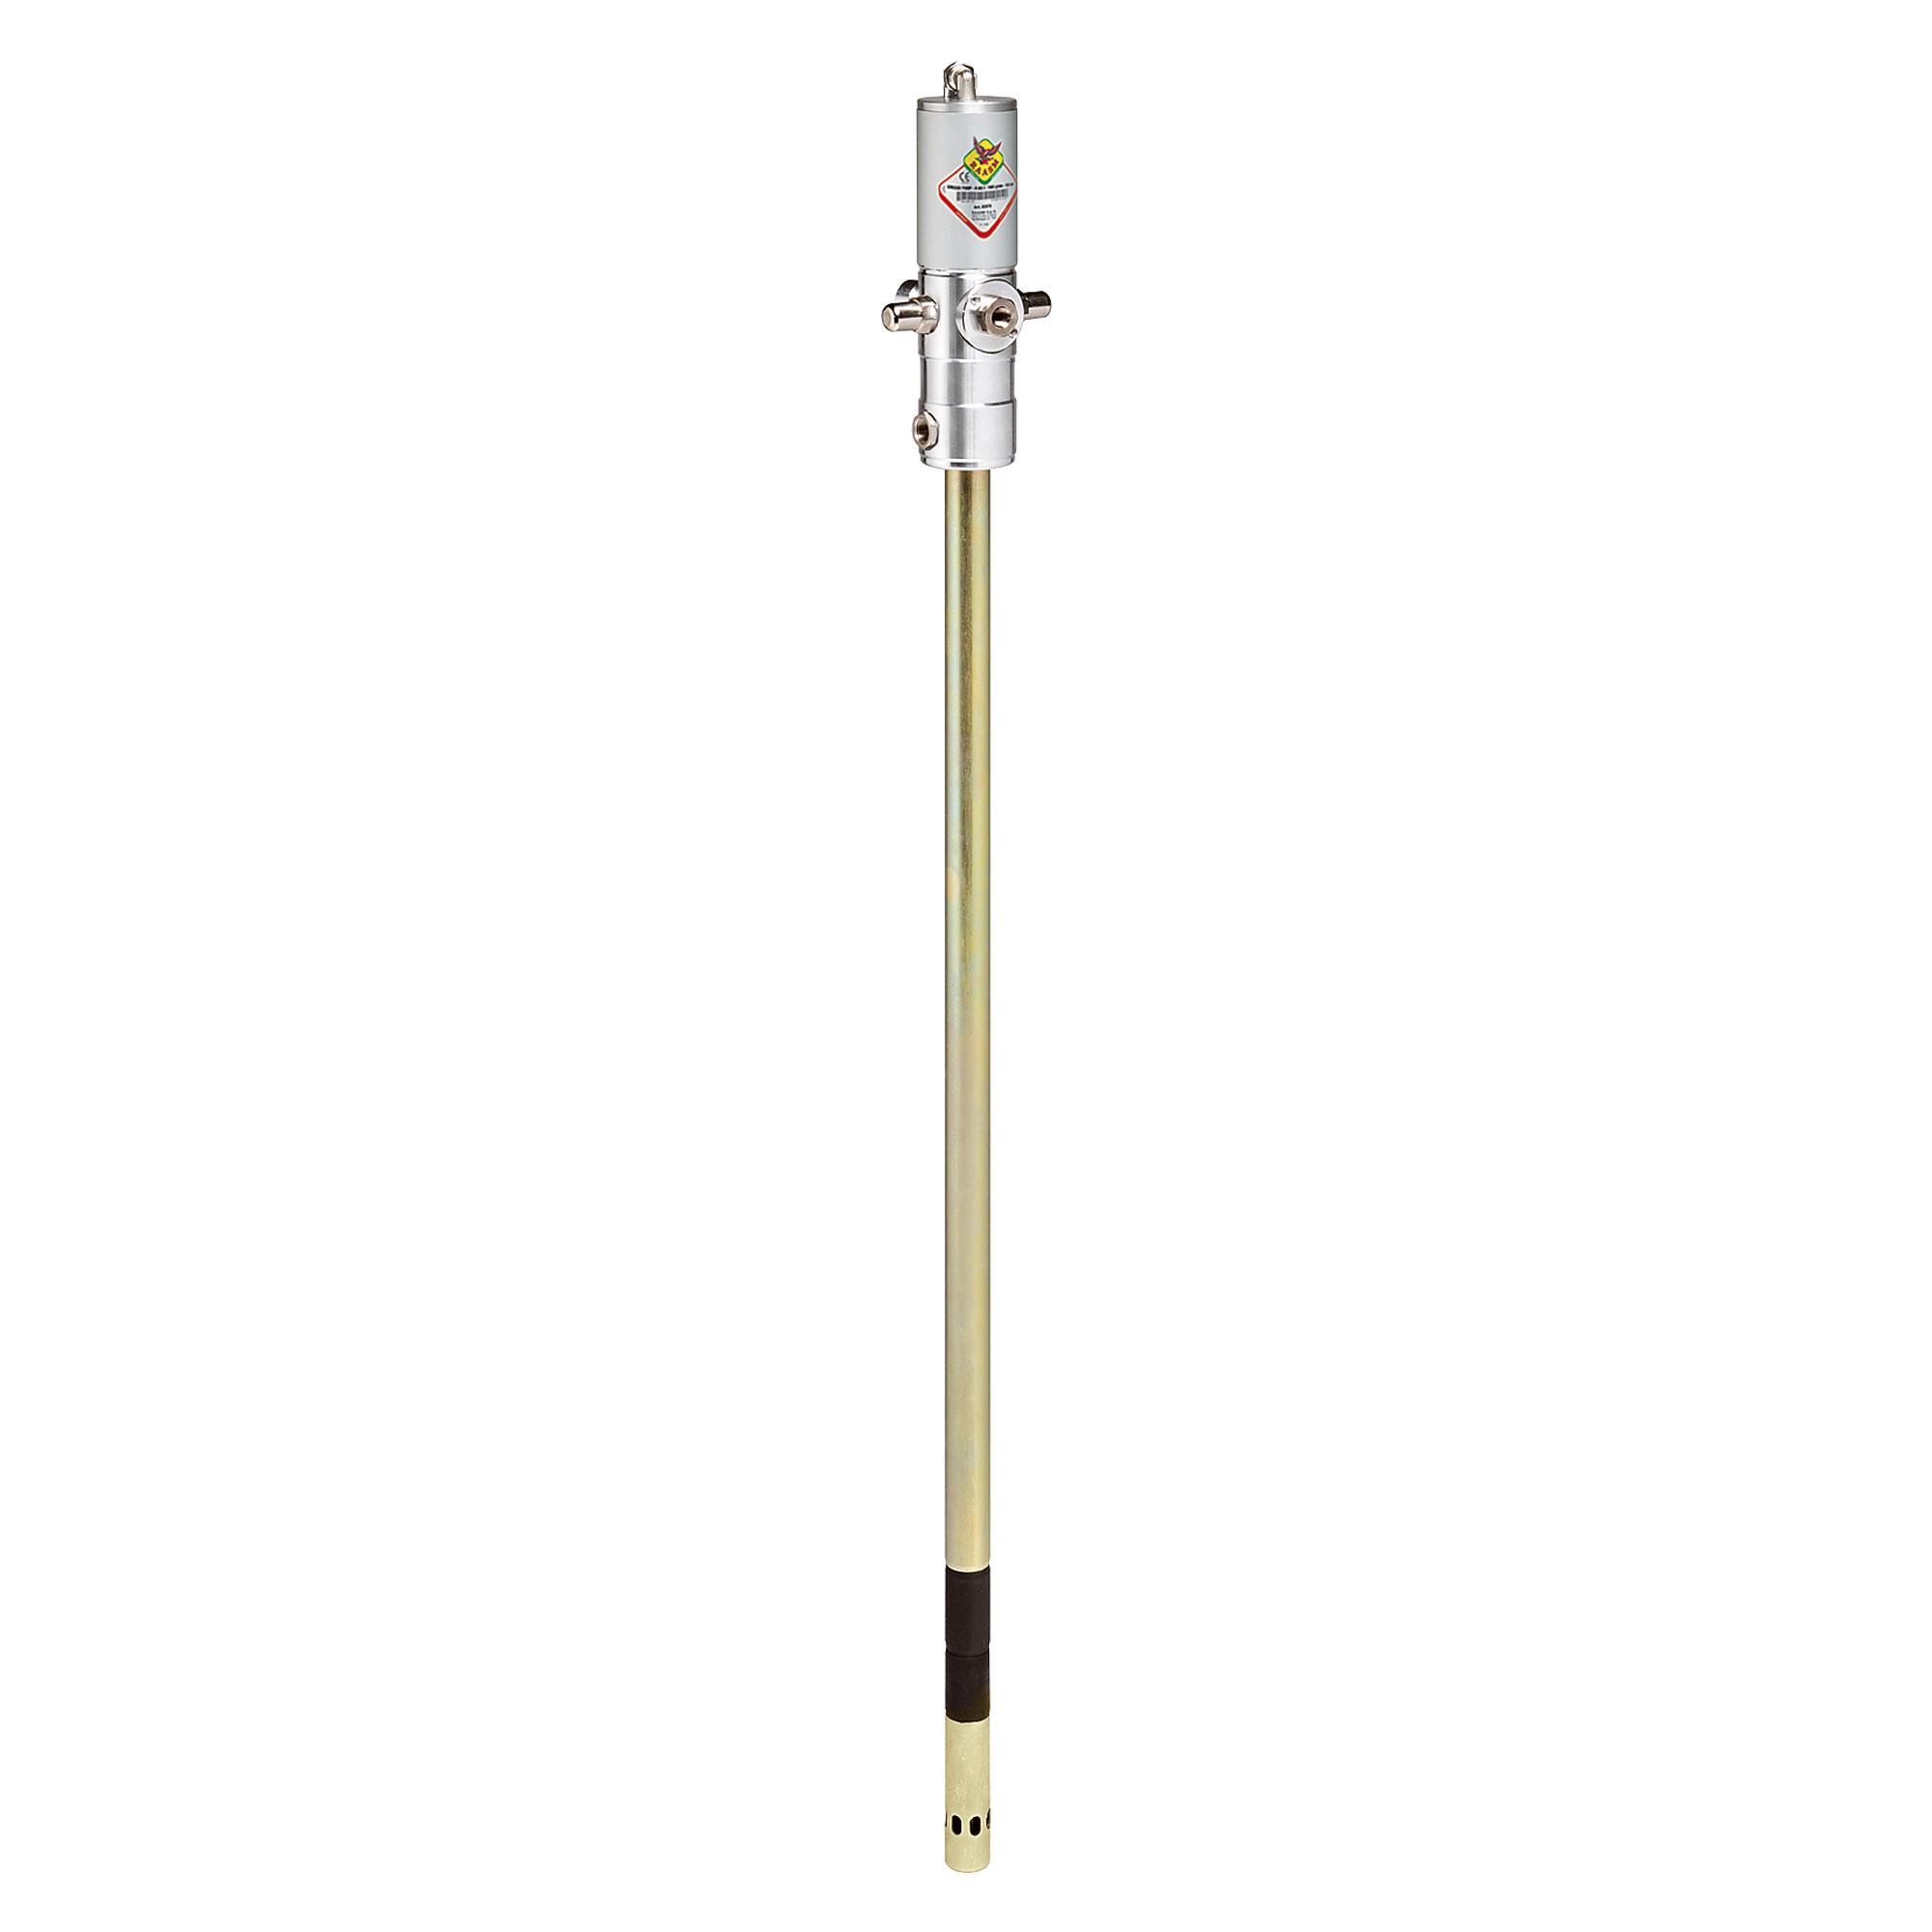 62095 - 50:1 Ratio Grease Pump, 180kg Drums